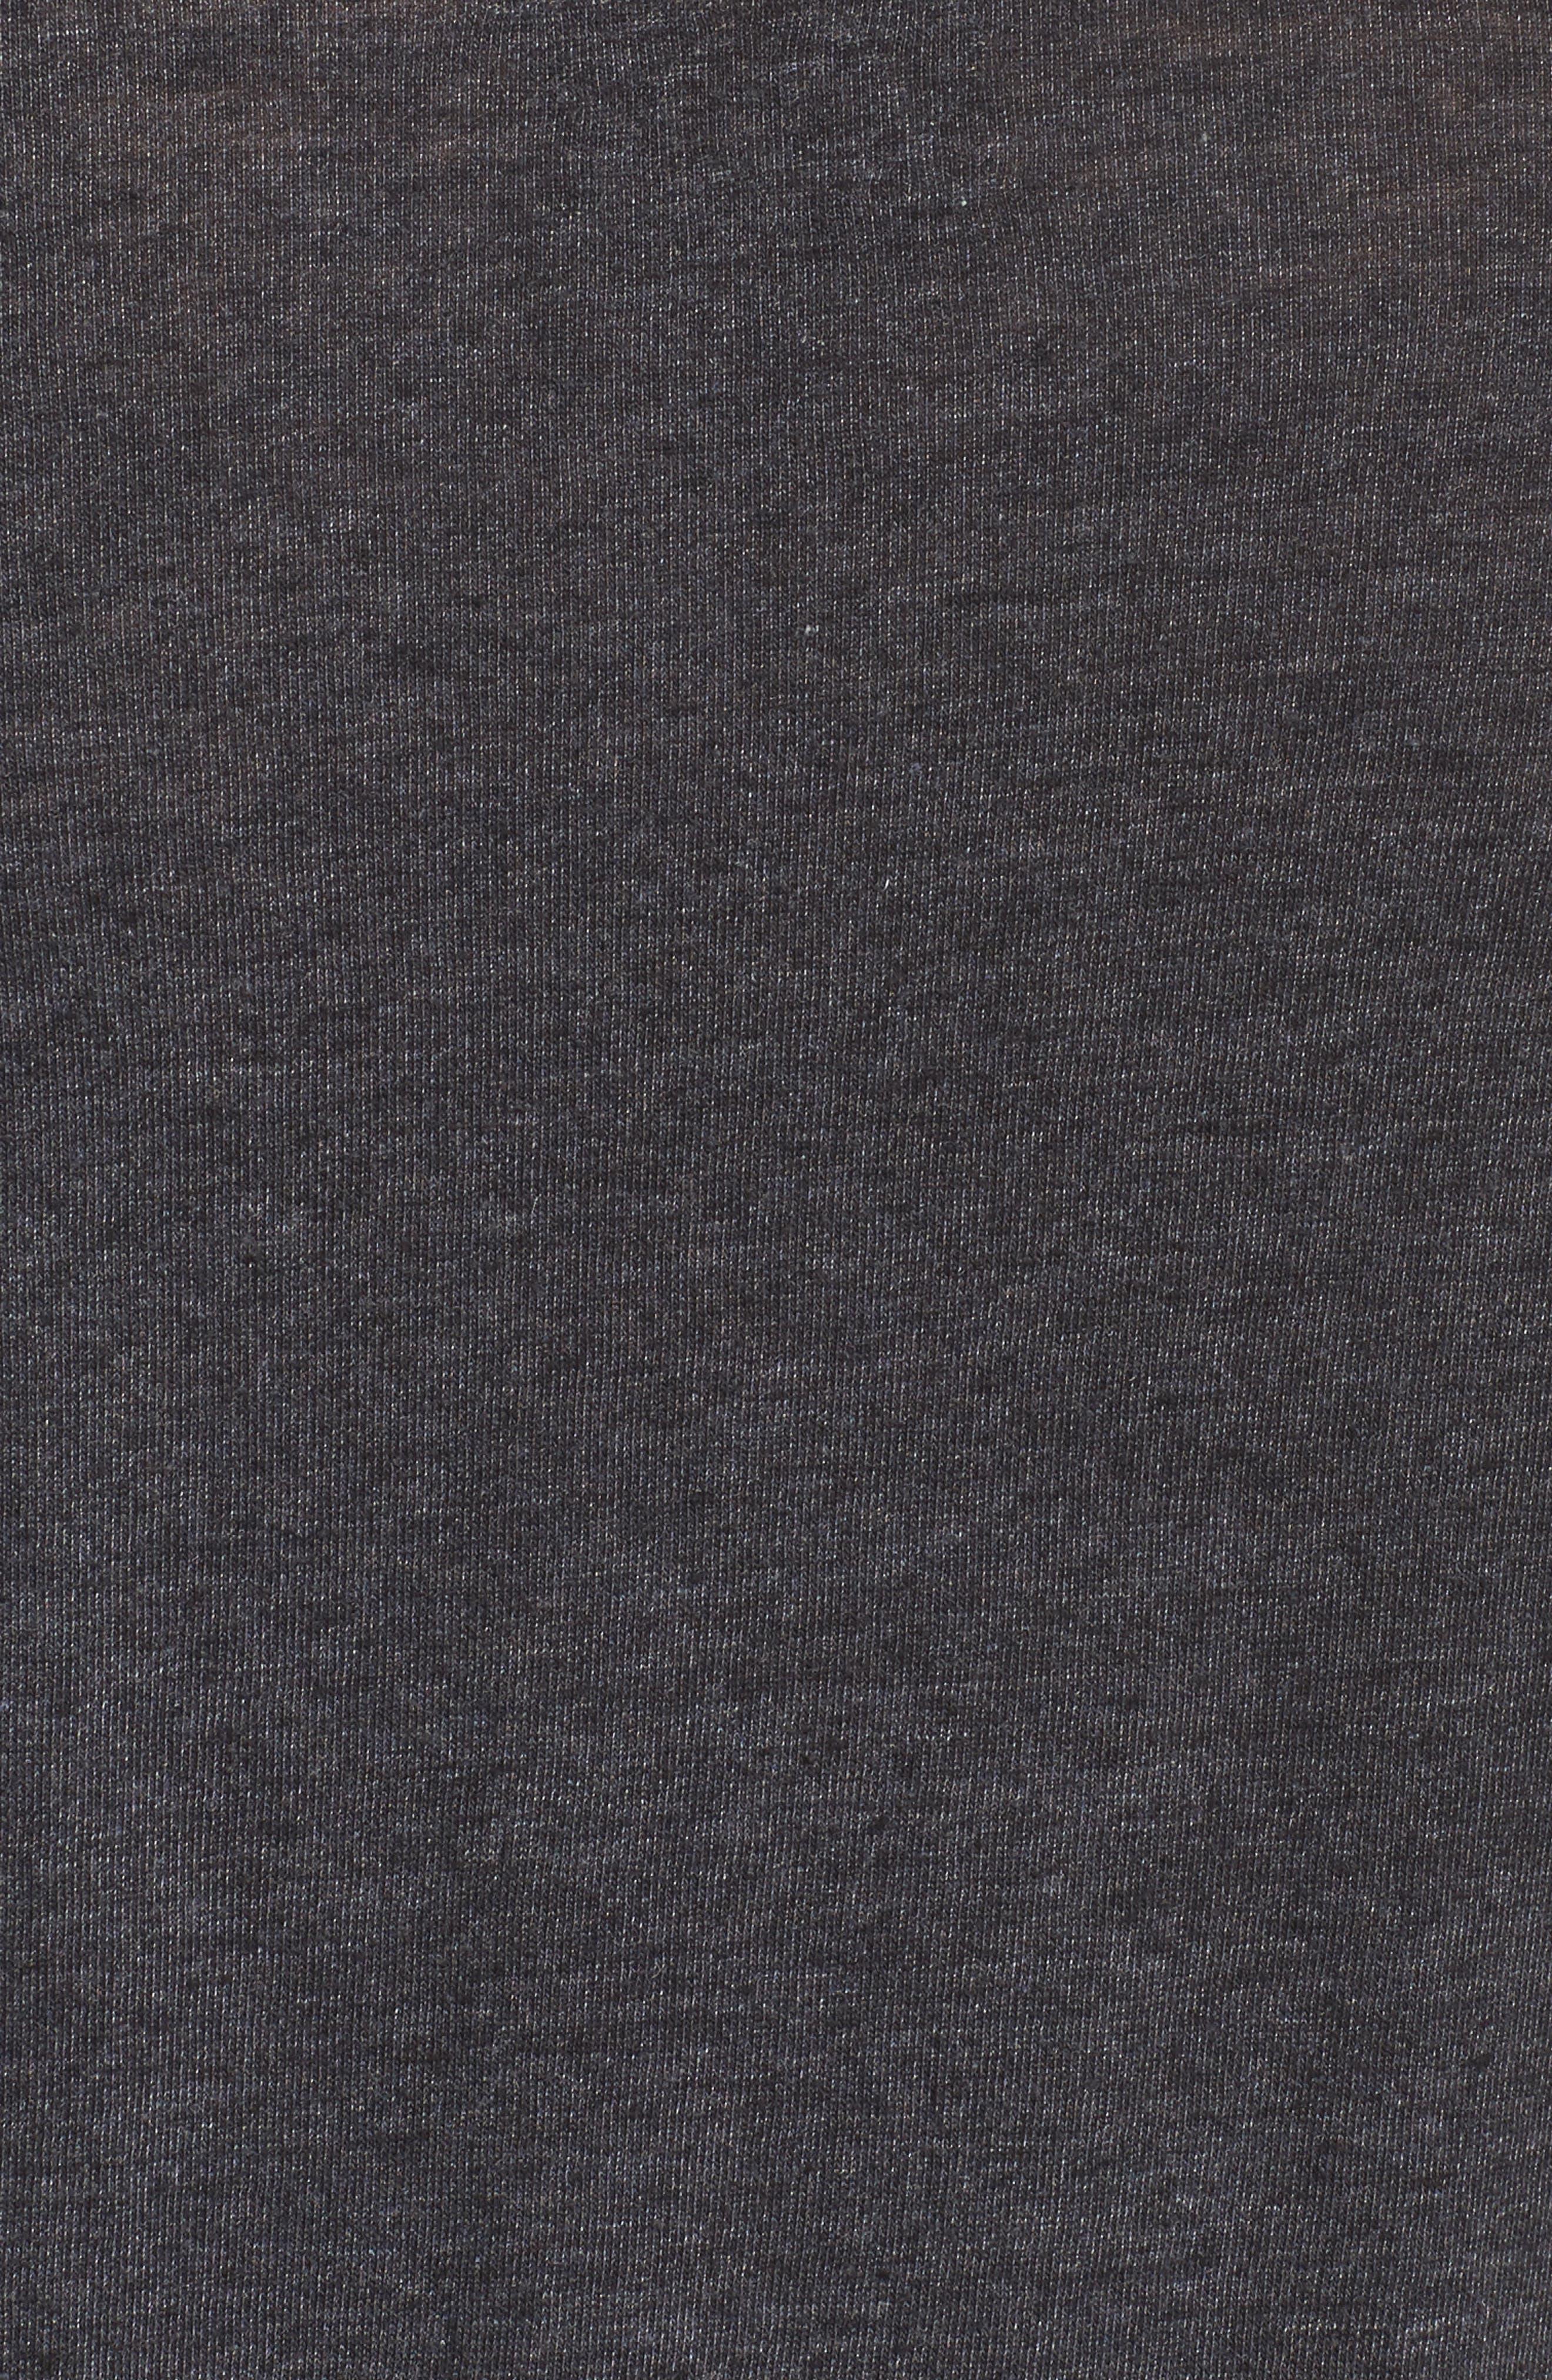 Cold Shoulder Jersey Tee,                             Alternate thumbnail 6, color,                             Black